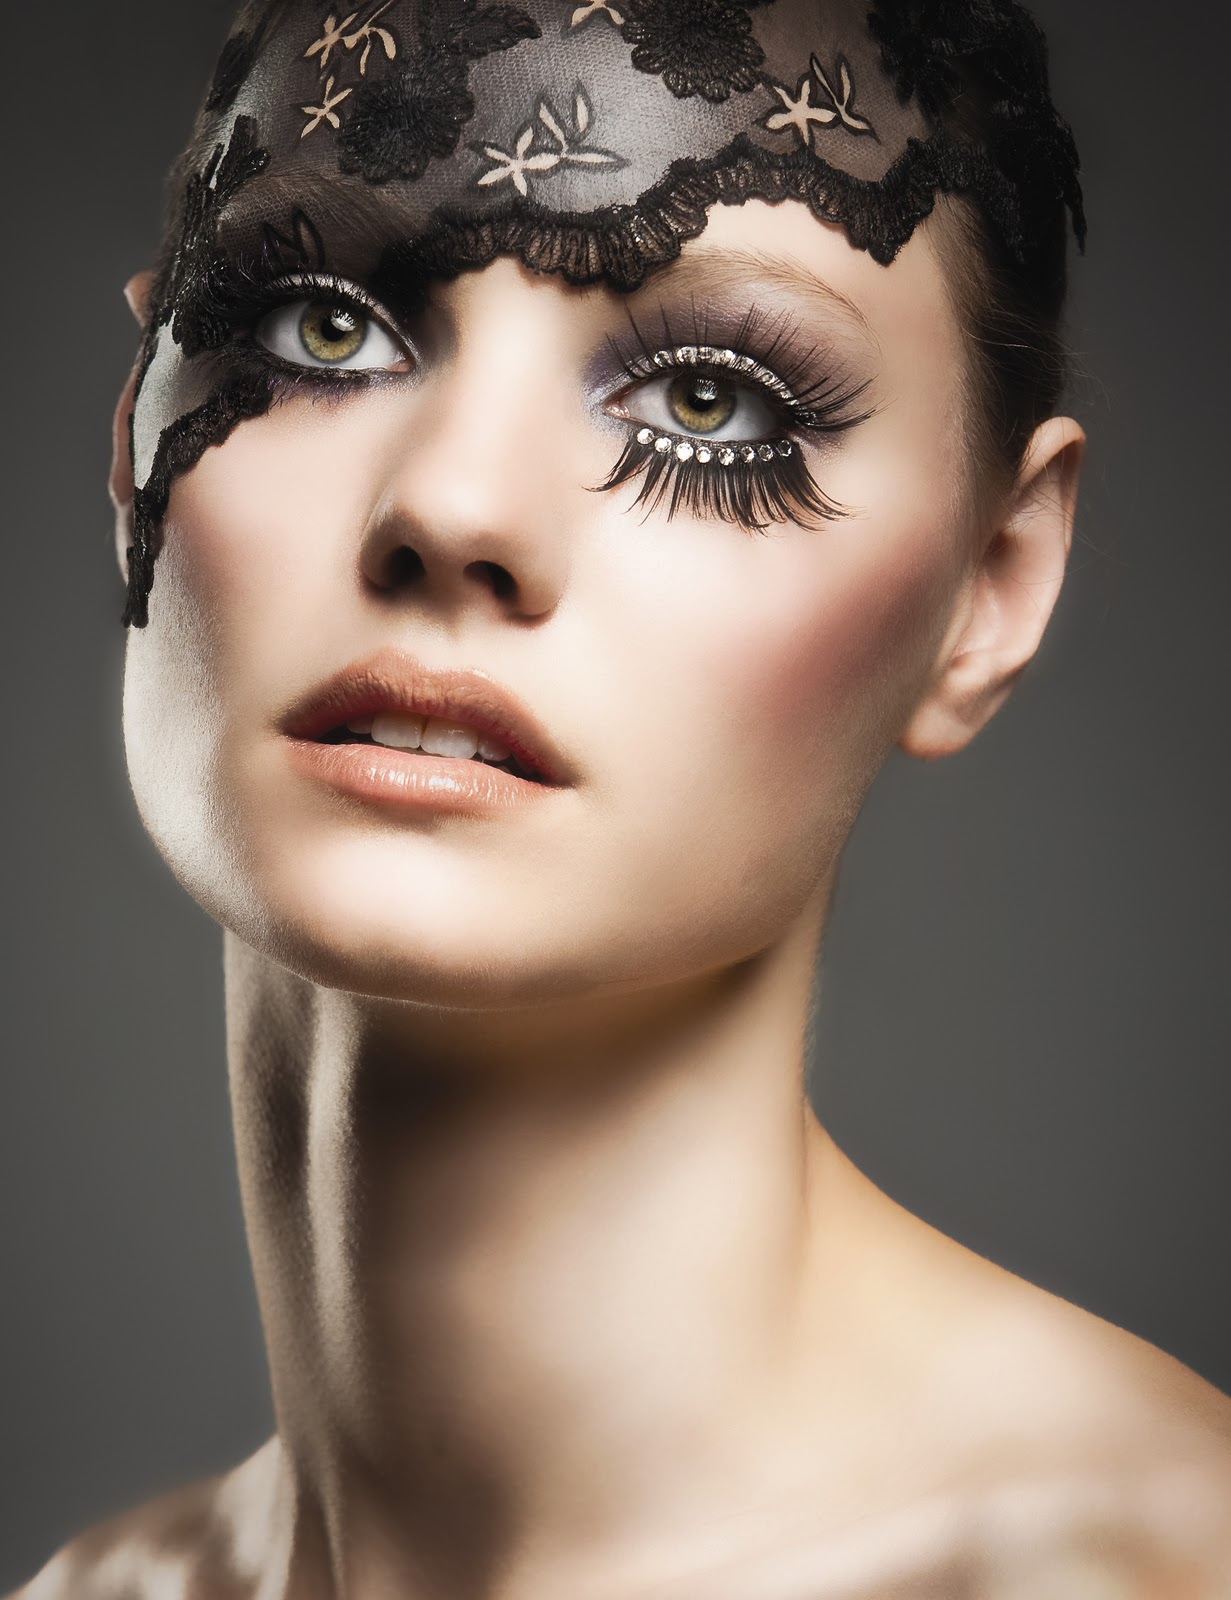 Makeup Artist Youtube: The Art Of Makeup